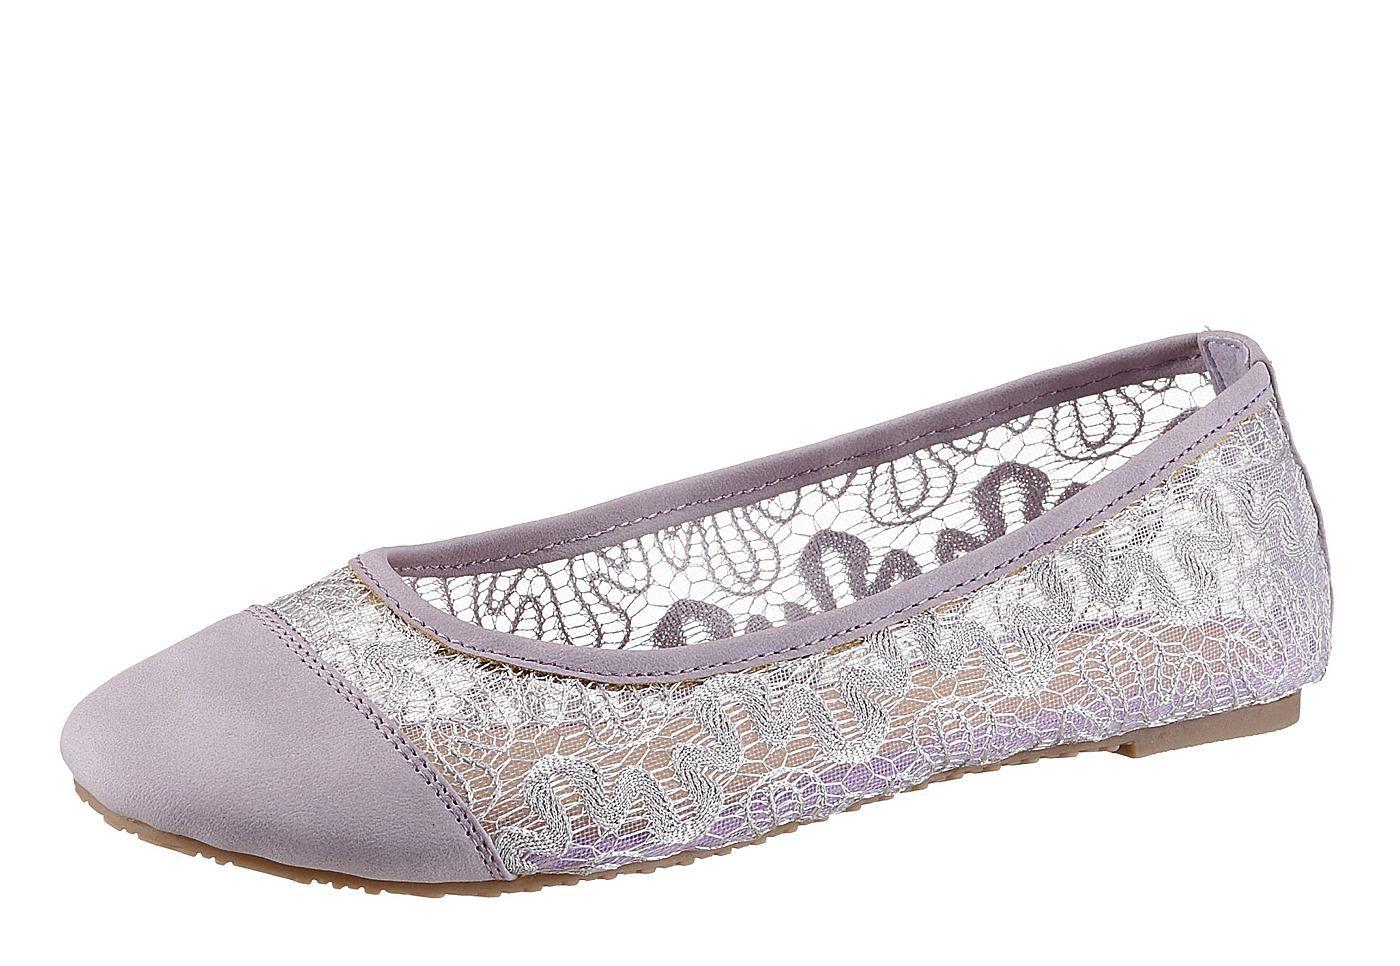 City Walk Ballerina aus Textil und Lederimitat, ungefüttert, Innensohle: Synthetik, Laufsohle: Synthetik, Schuhweite: normal (Weite F)....